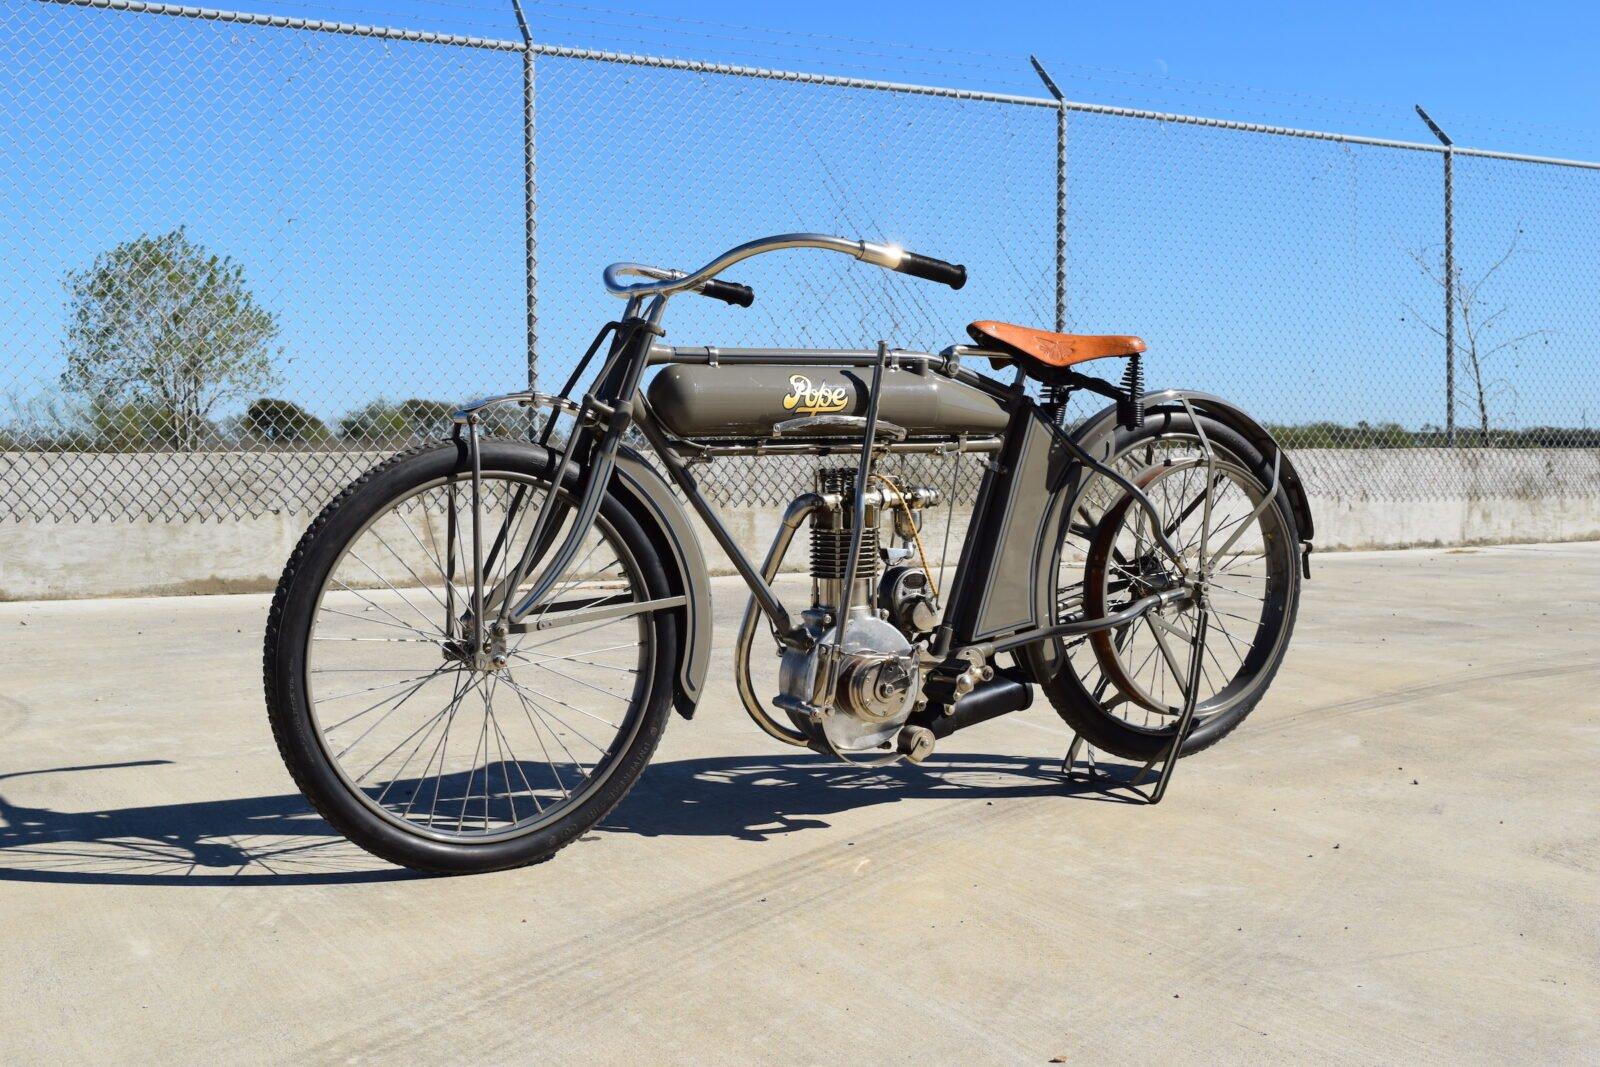 Pope Motorcycle 12 1600x1067 - Steve McQueen's Pope Model K Motorcycle